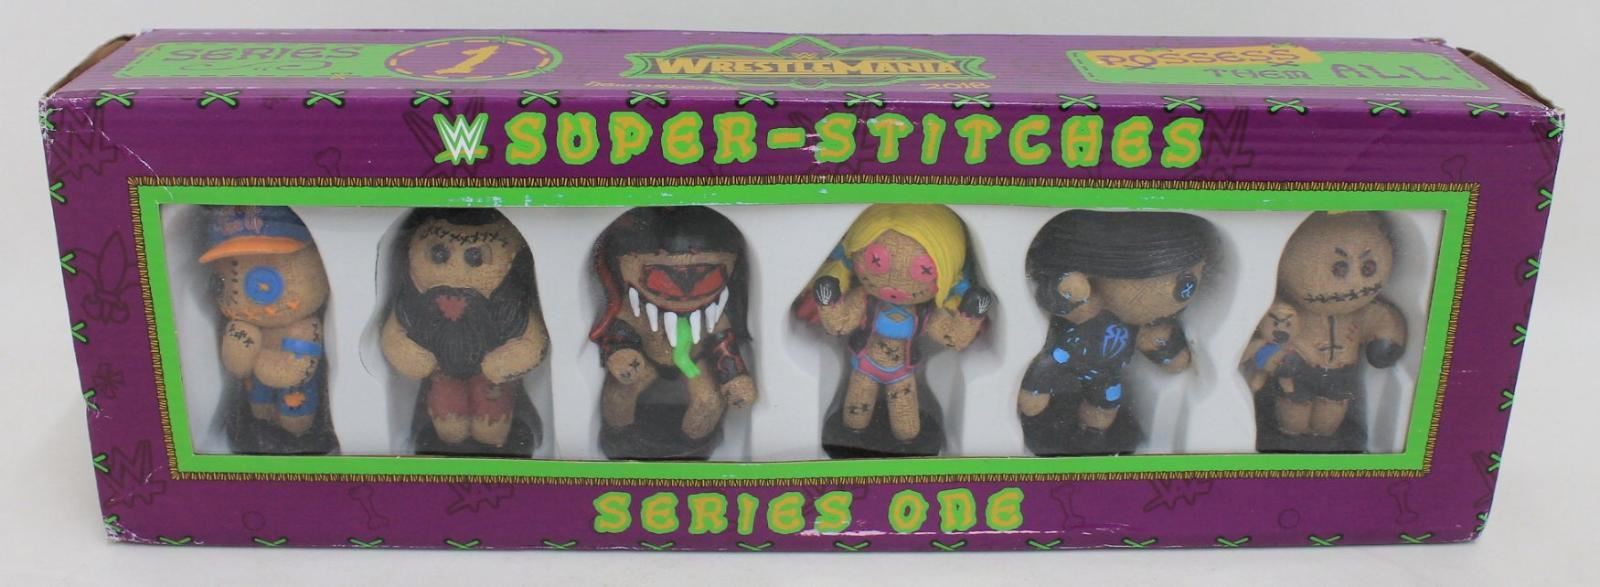 BNIB WWE Wrestlemania New Orleans 2018 Series One Super-Stitches Voodoo Figures